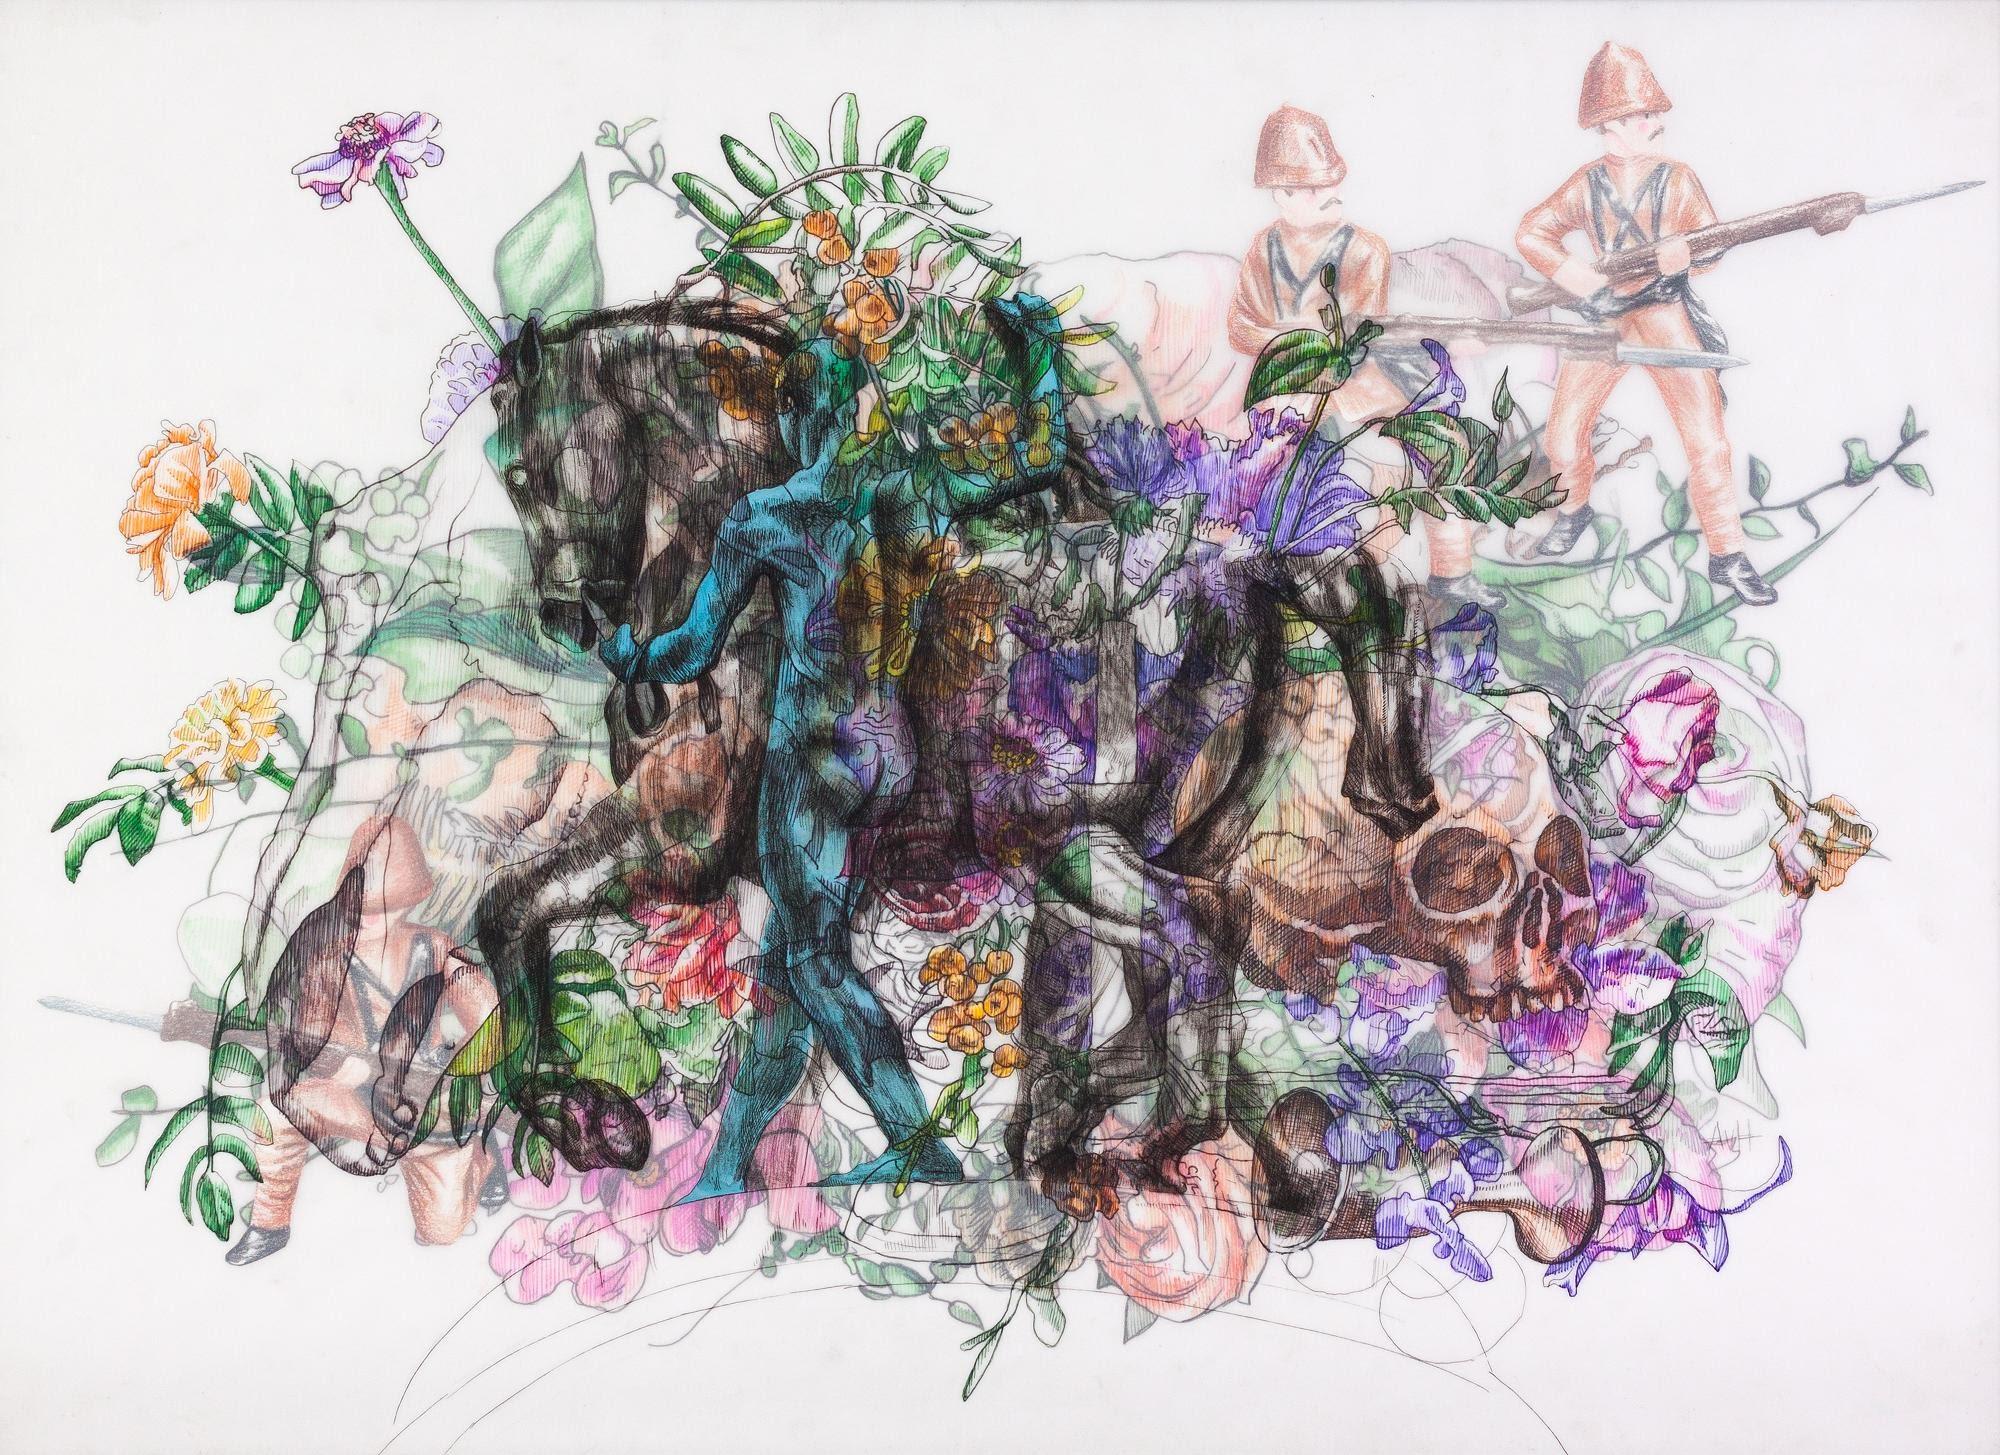 Zeitgeist, Ink, Charcoal, Gouache, Pencil on Tracing Paper, 42 x 58 cm